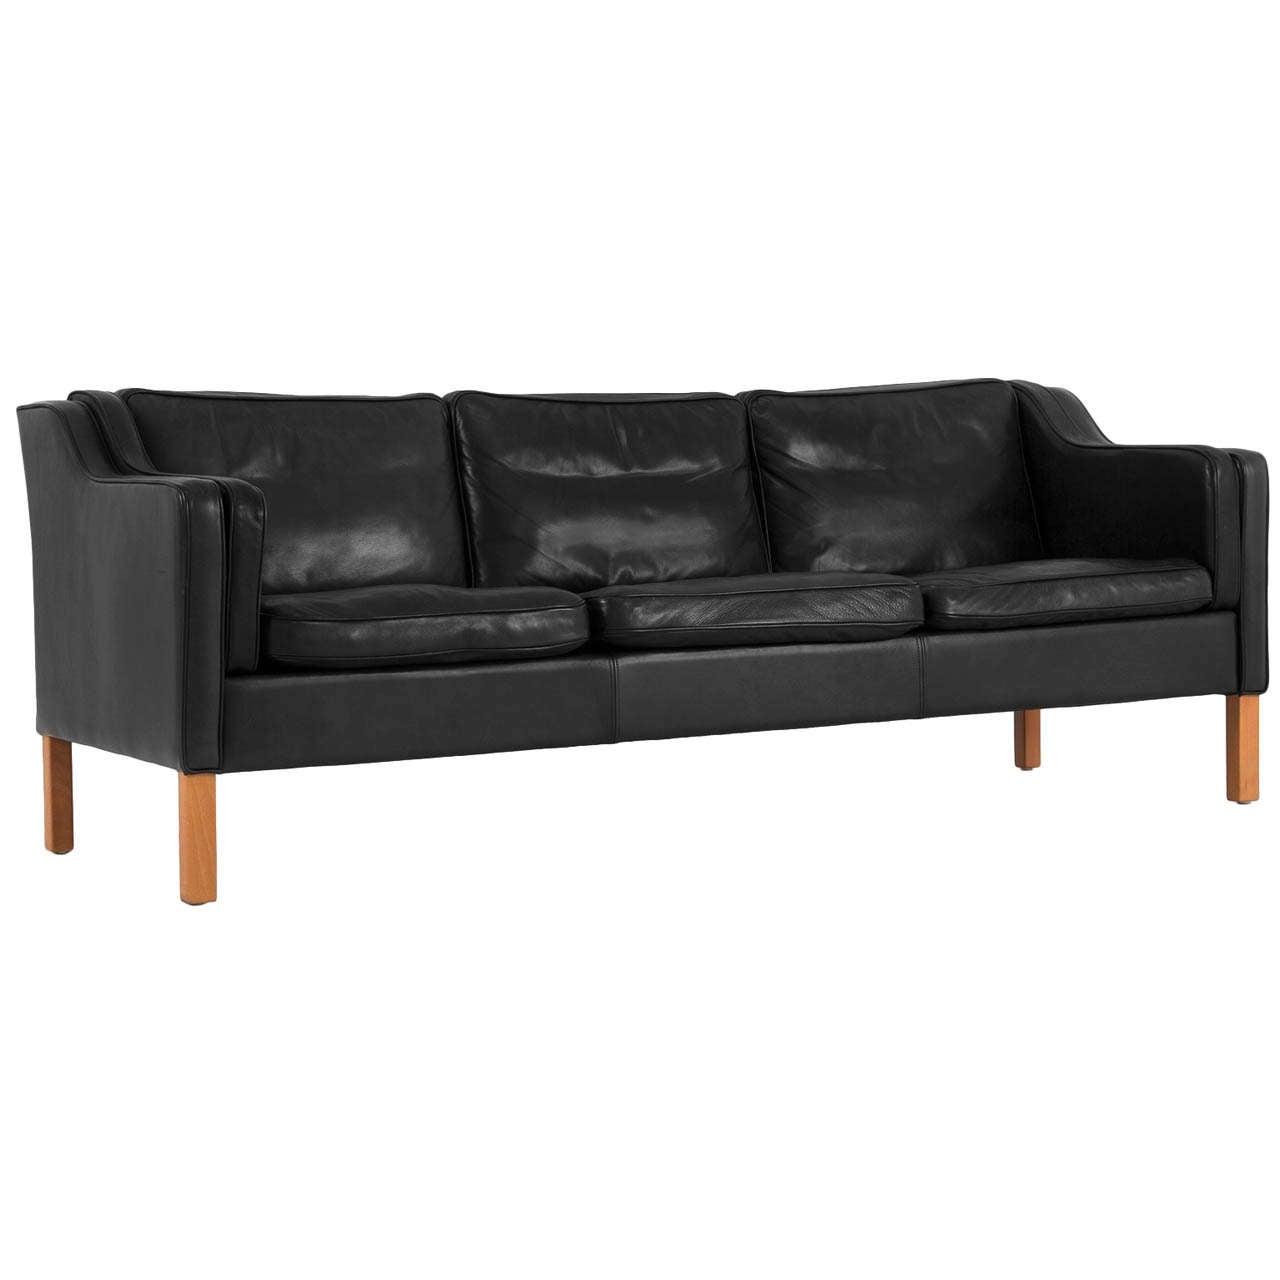 borge mogensen sofa model 2209 black leather sleeper danish for sale at 1stdibs